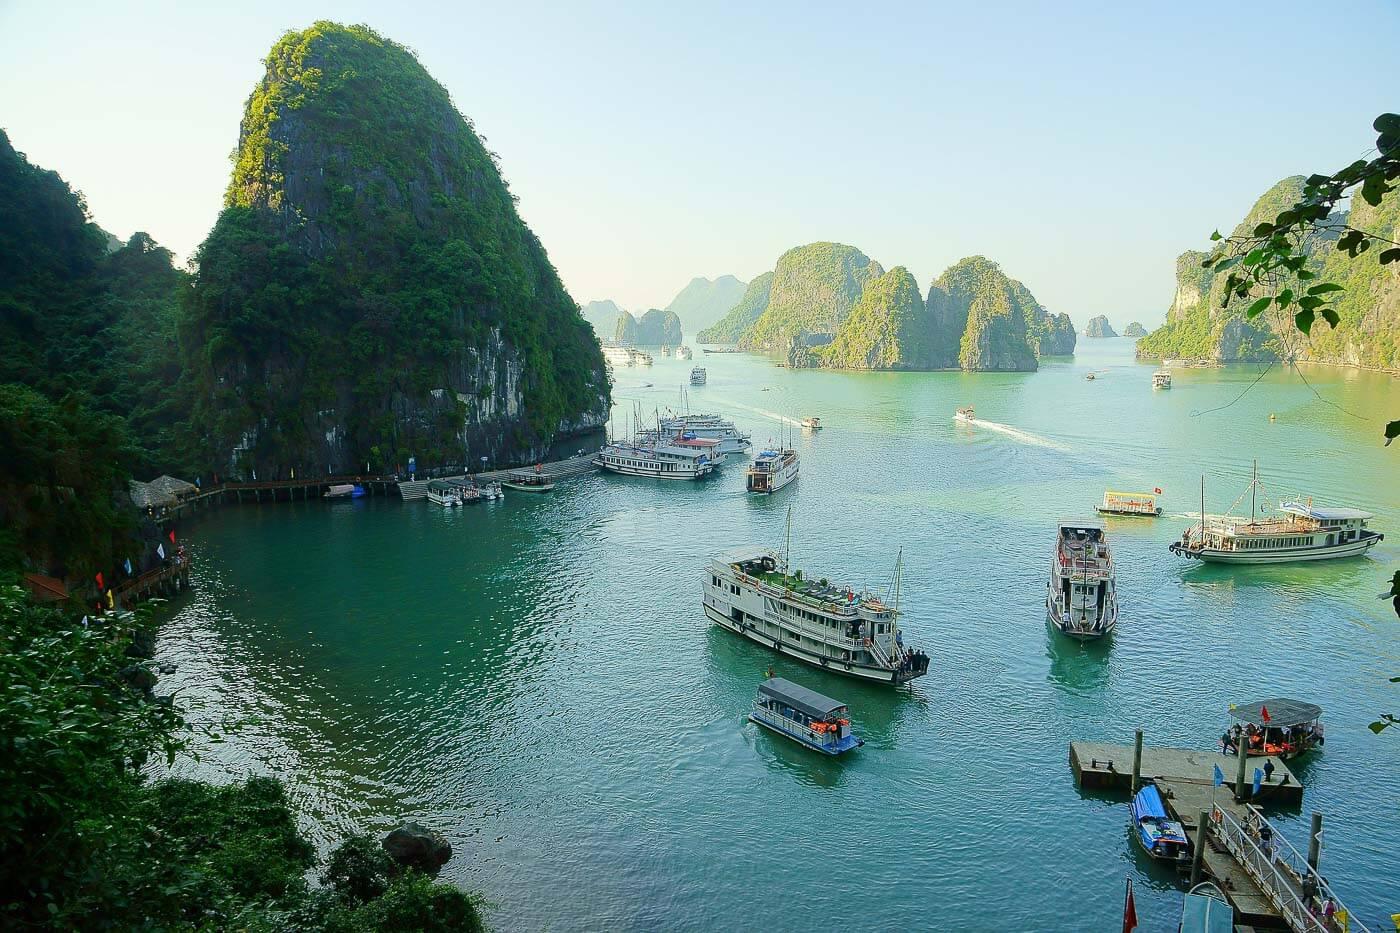 Turismo no Vietna - Ha Long Bay